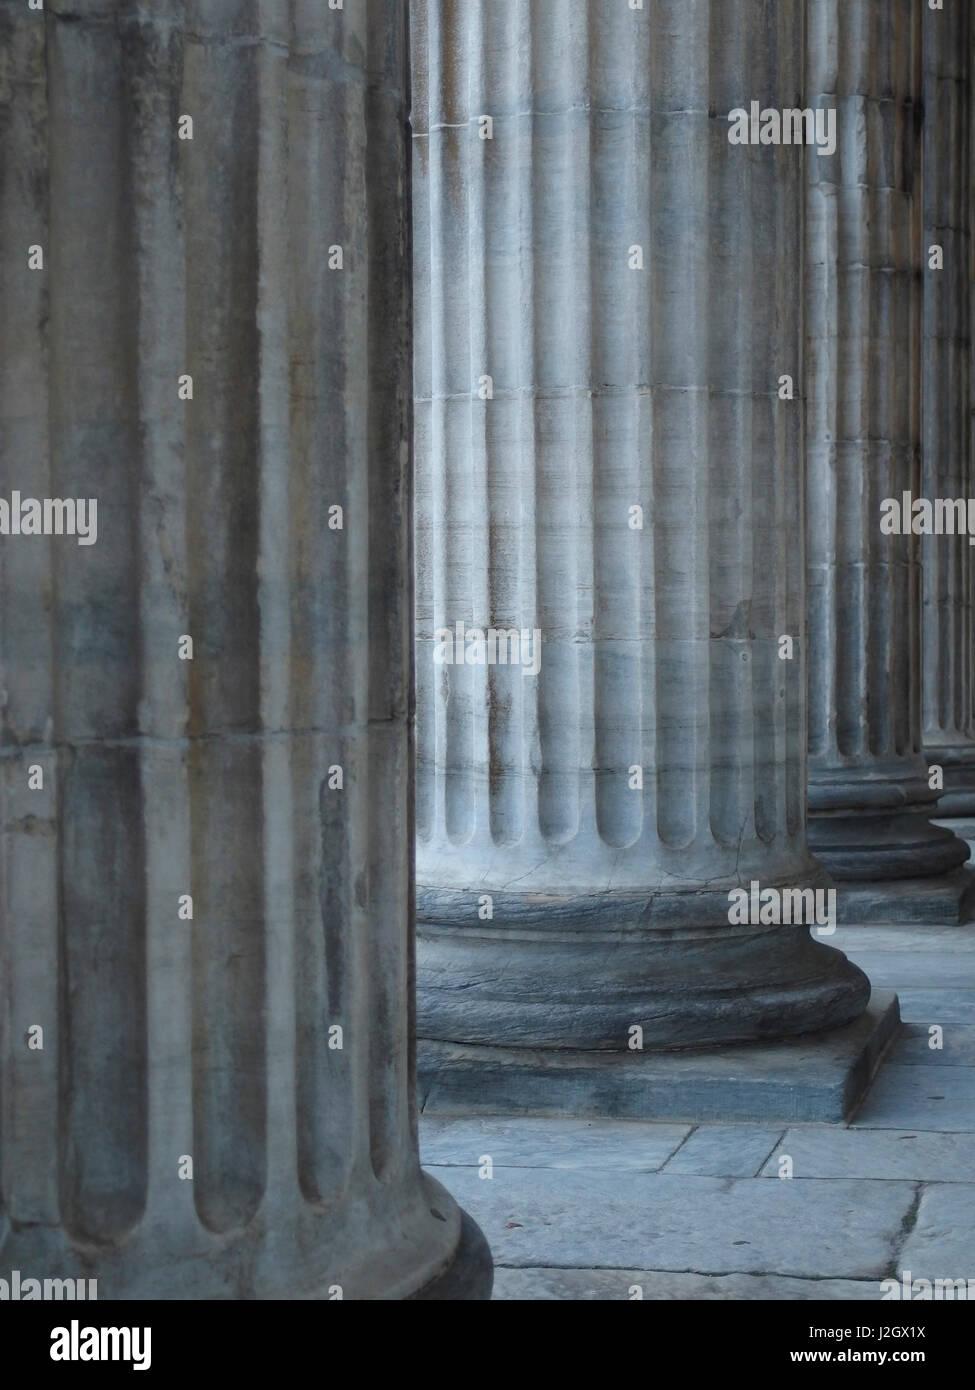 Column of Merchants Exchange Building in Philadelphia, Pennsylvania, United States. - Stock Image